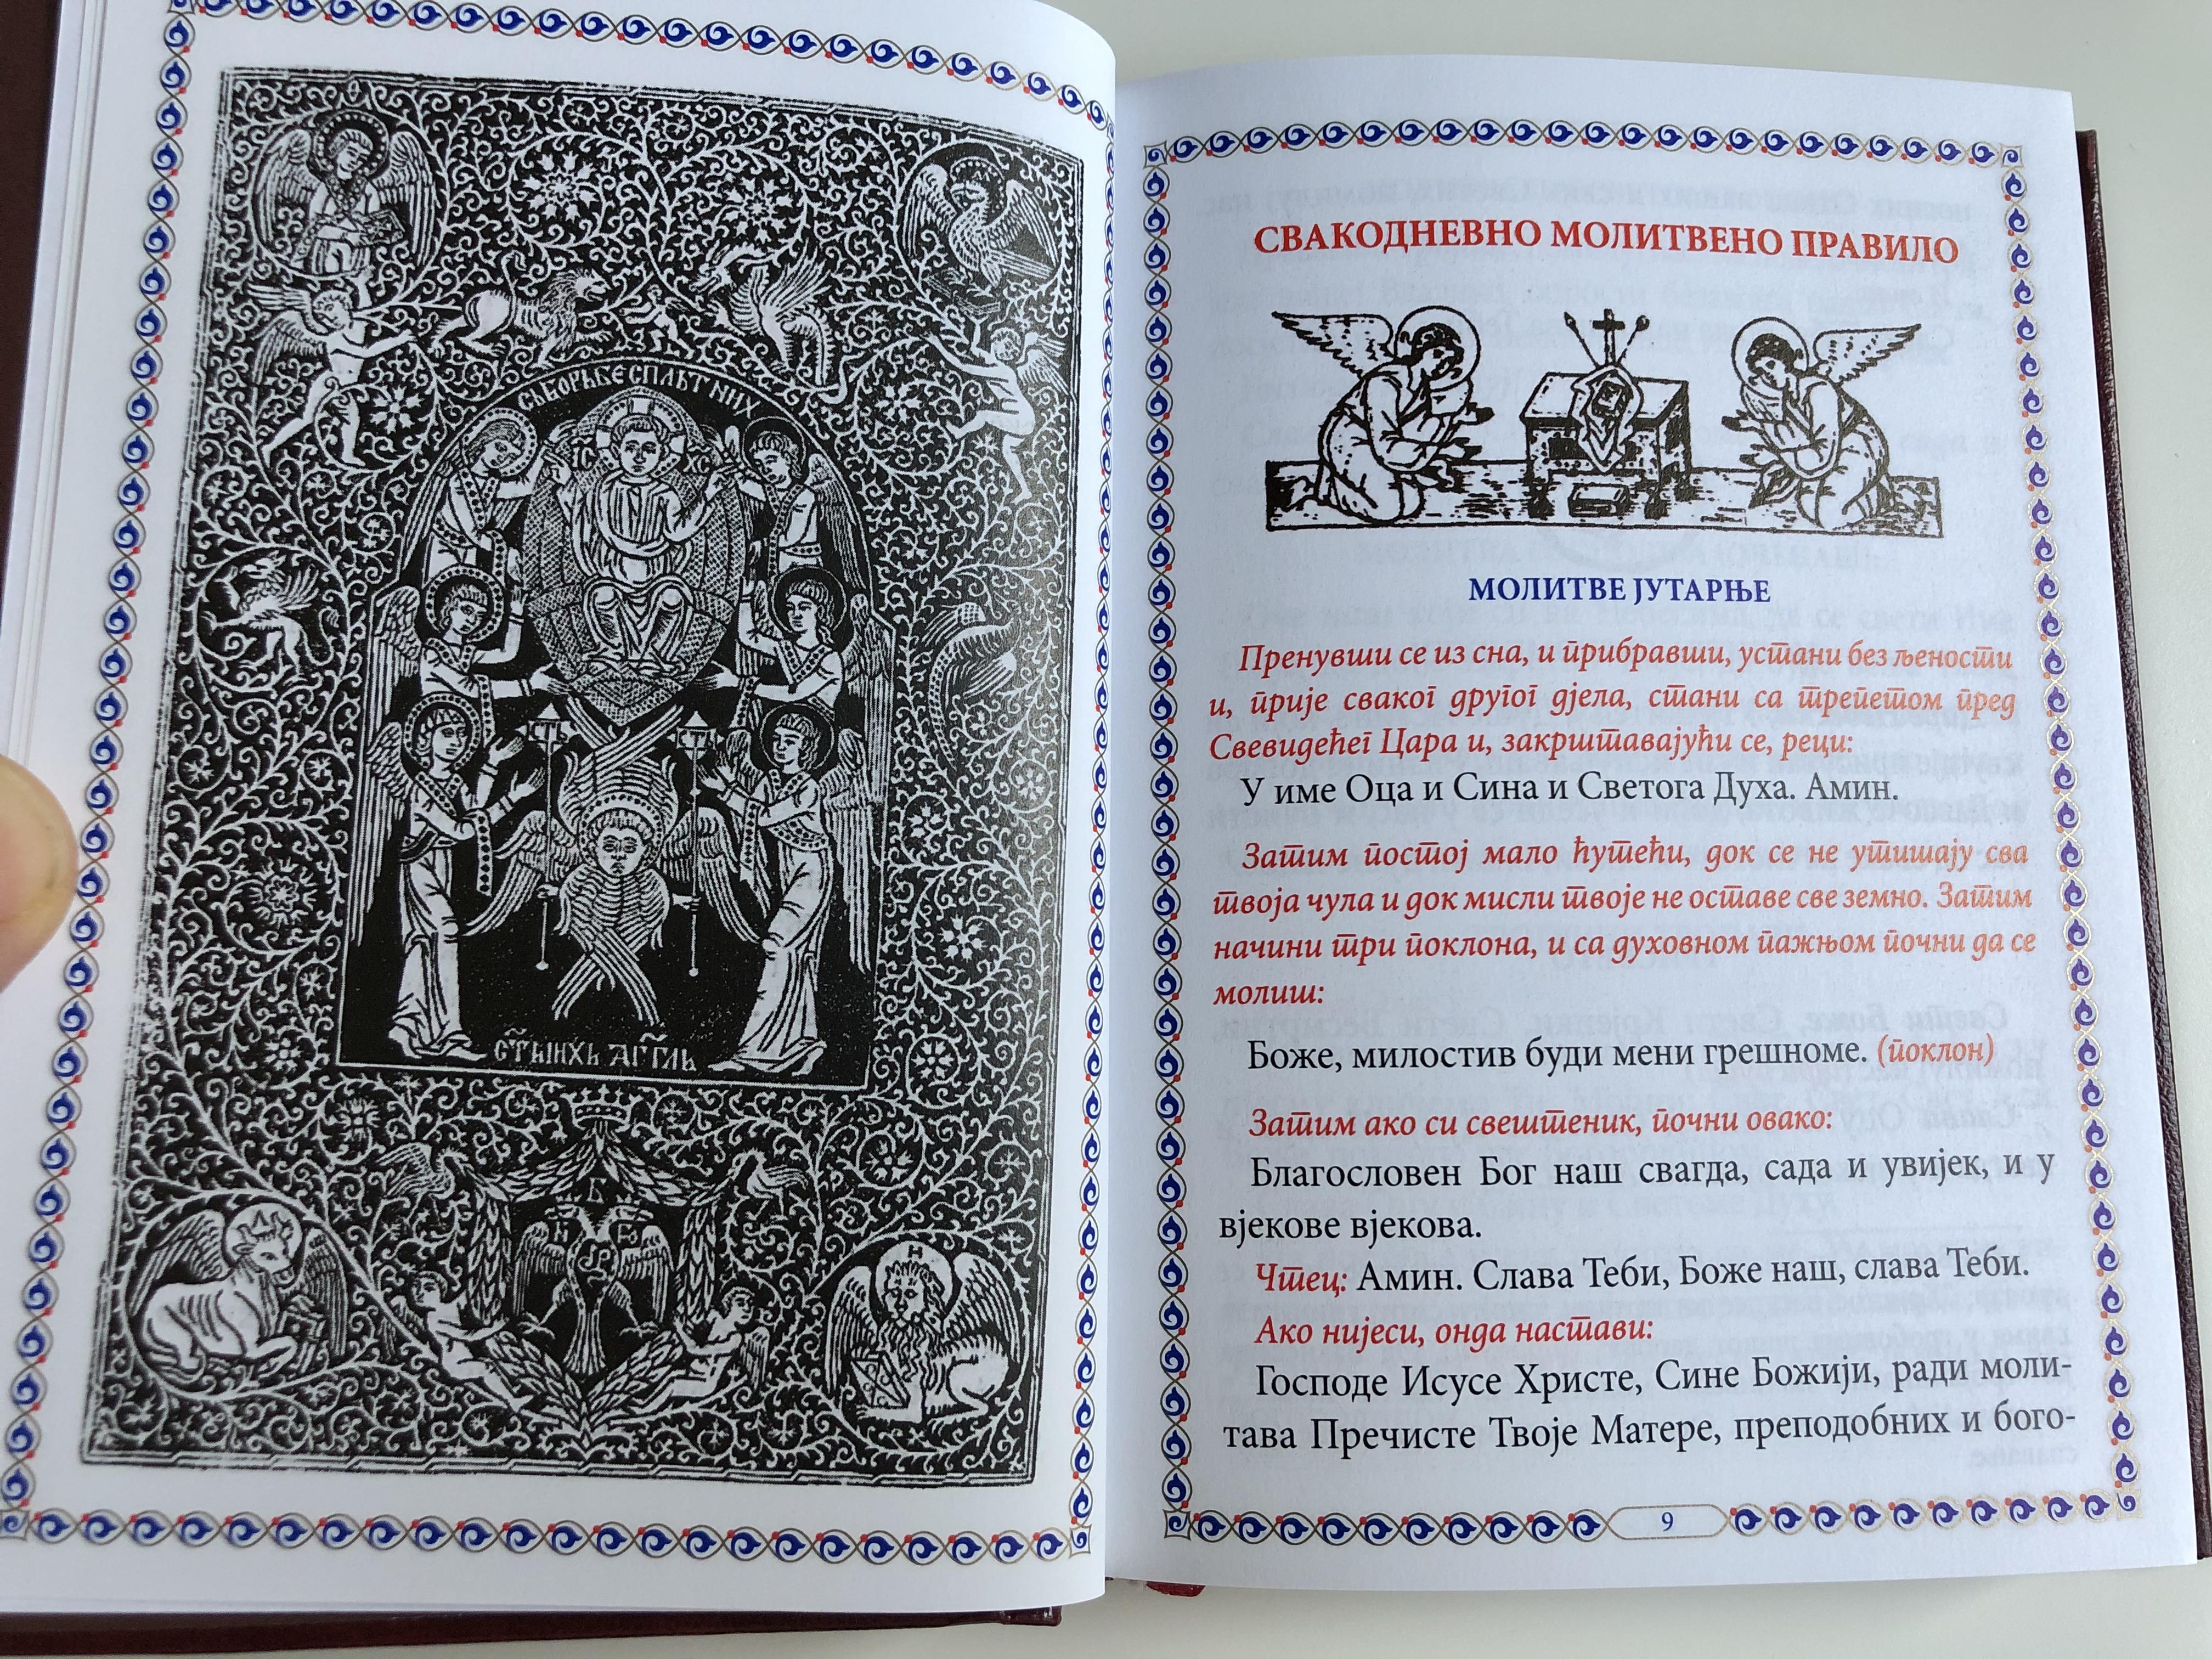 pravoslavni-molitvenik-small-serbian-orthodox-prayer-book-2015-5.jpg